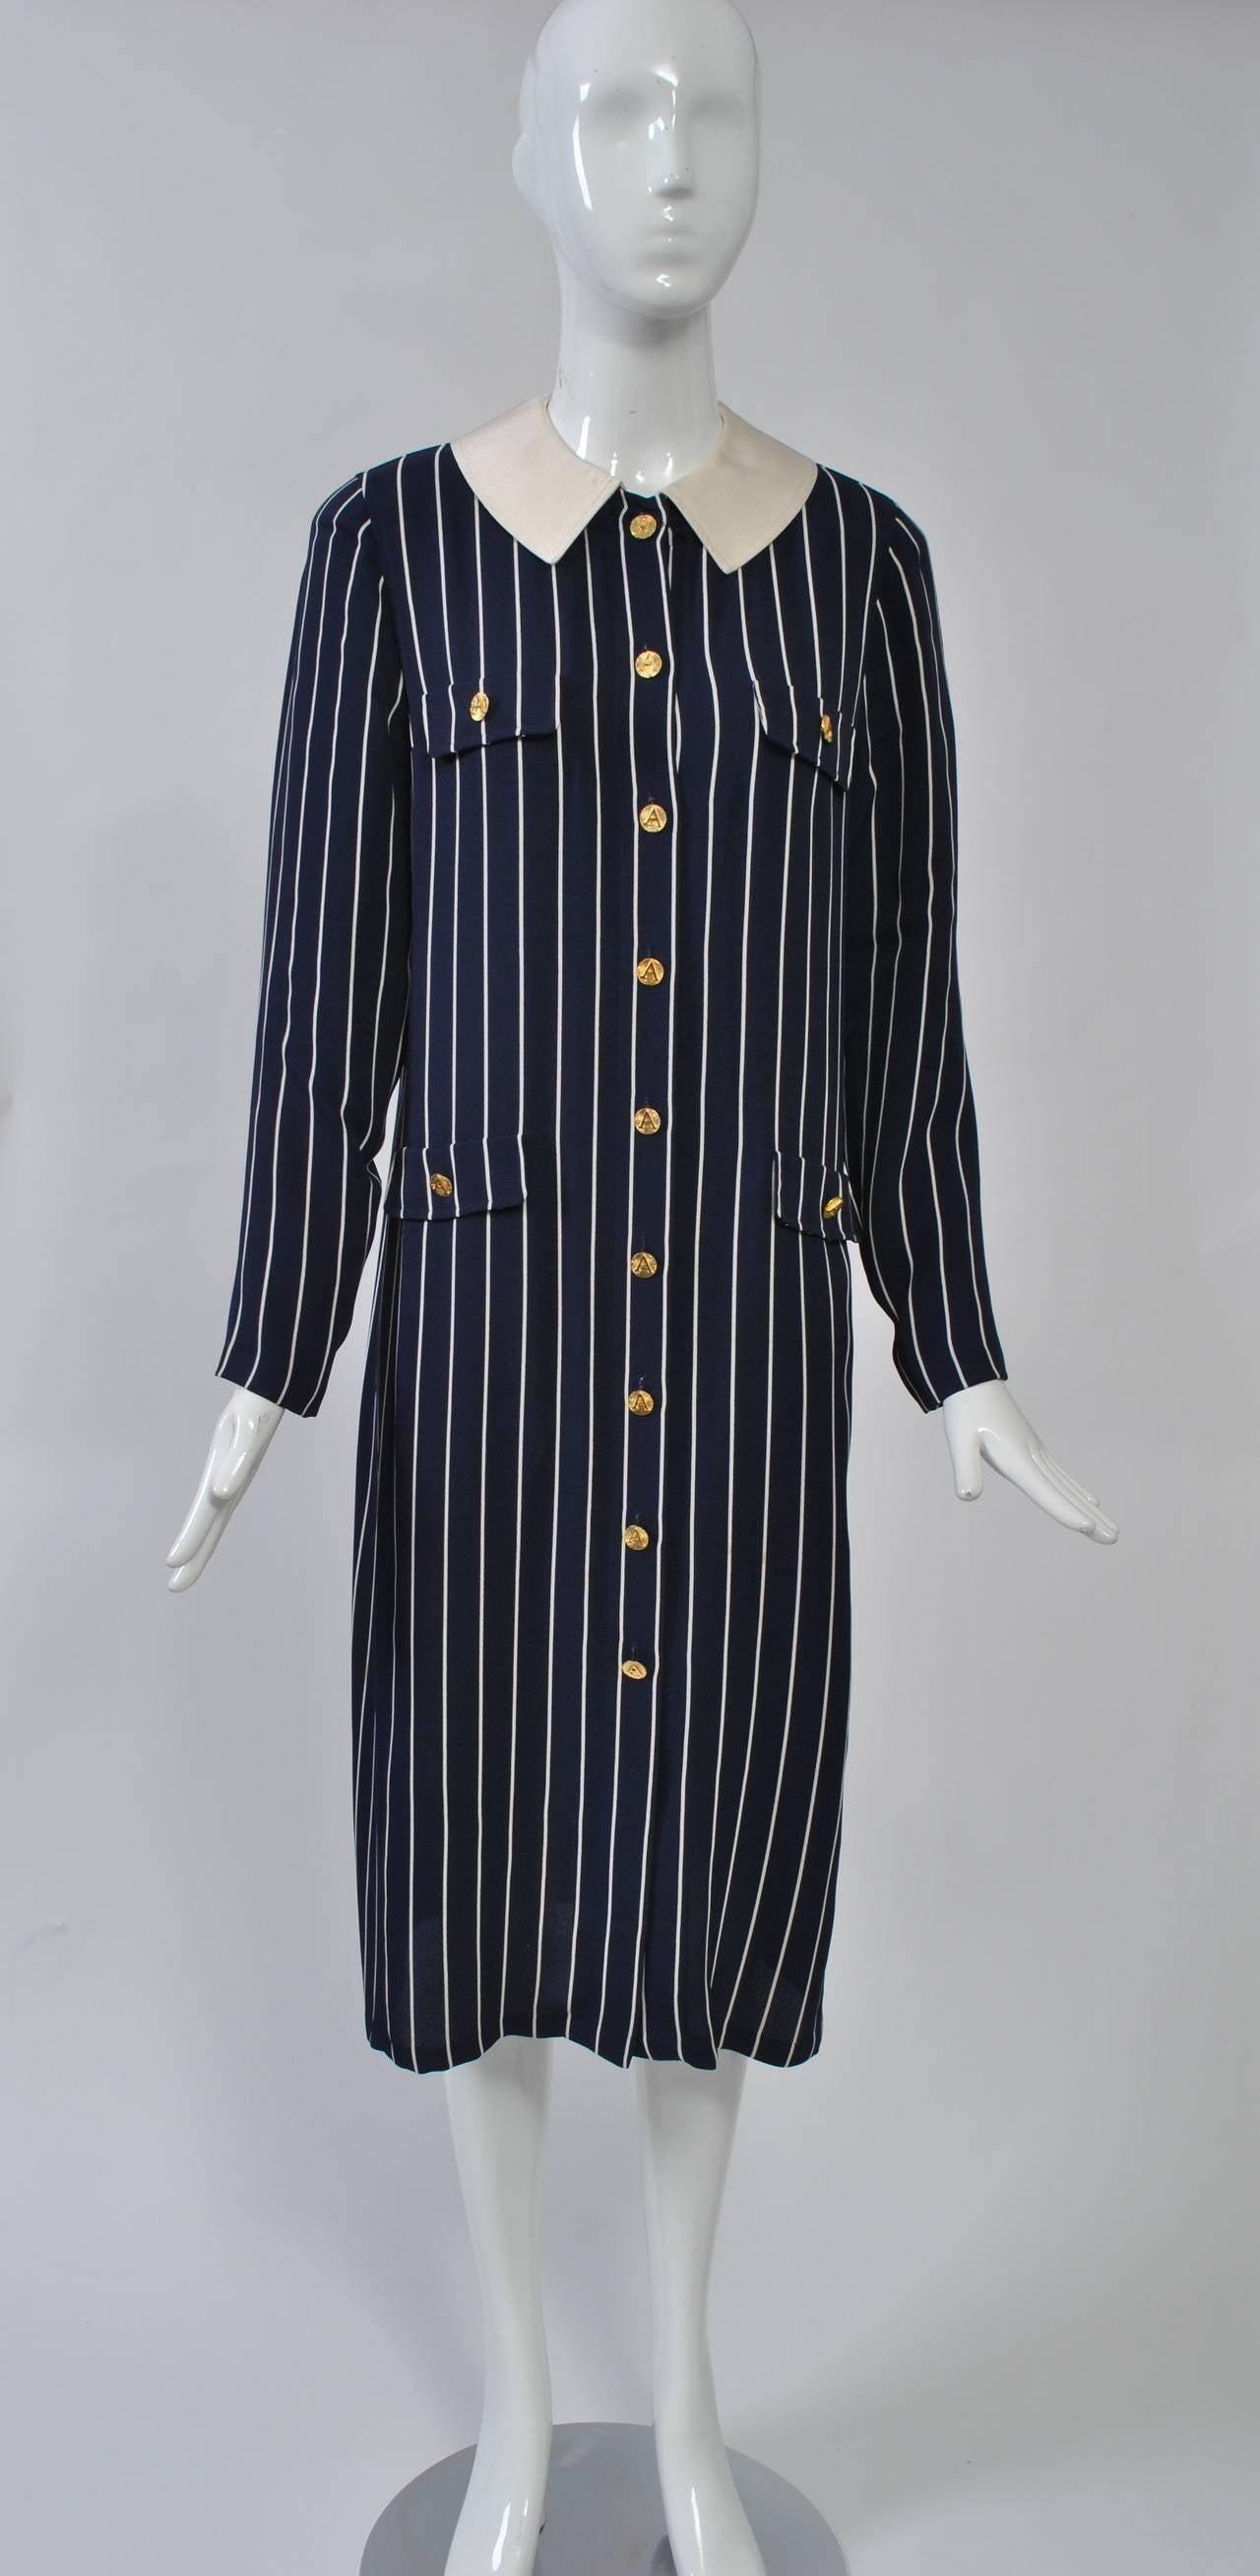 Adolfo Pinstripe Shirtdress 2